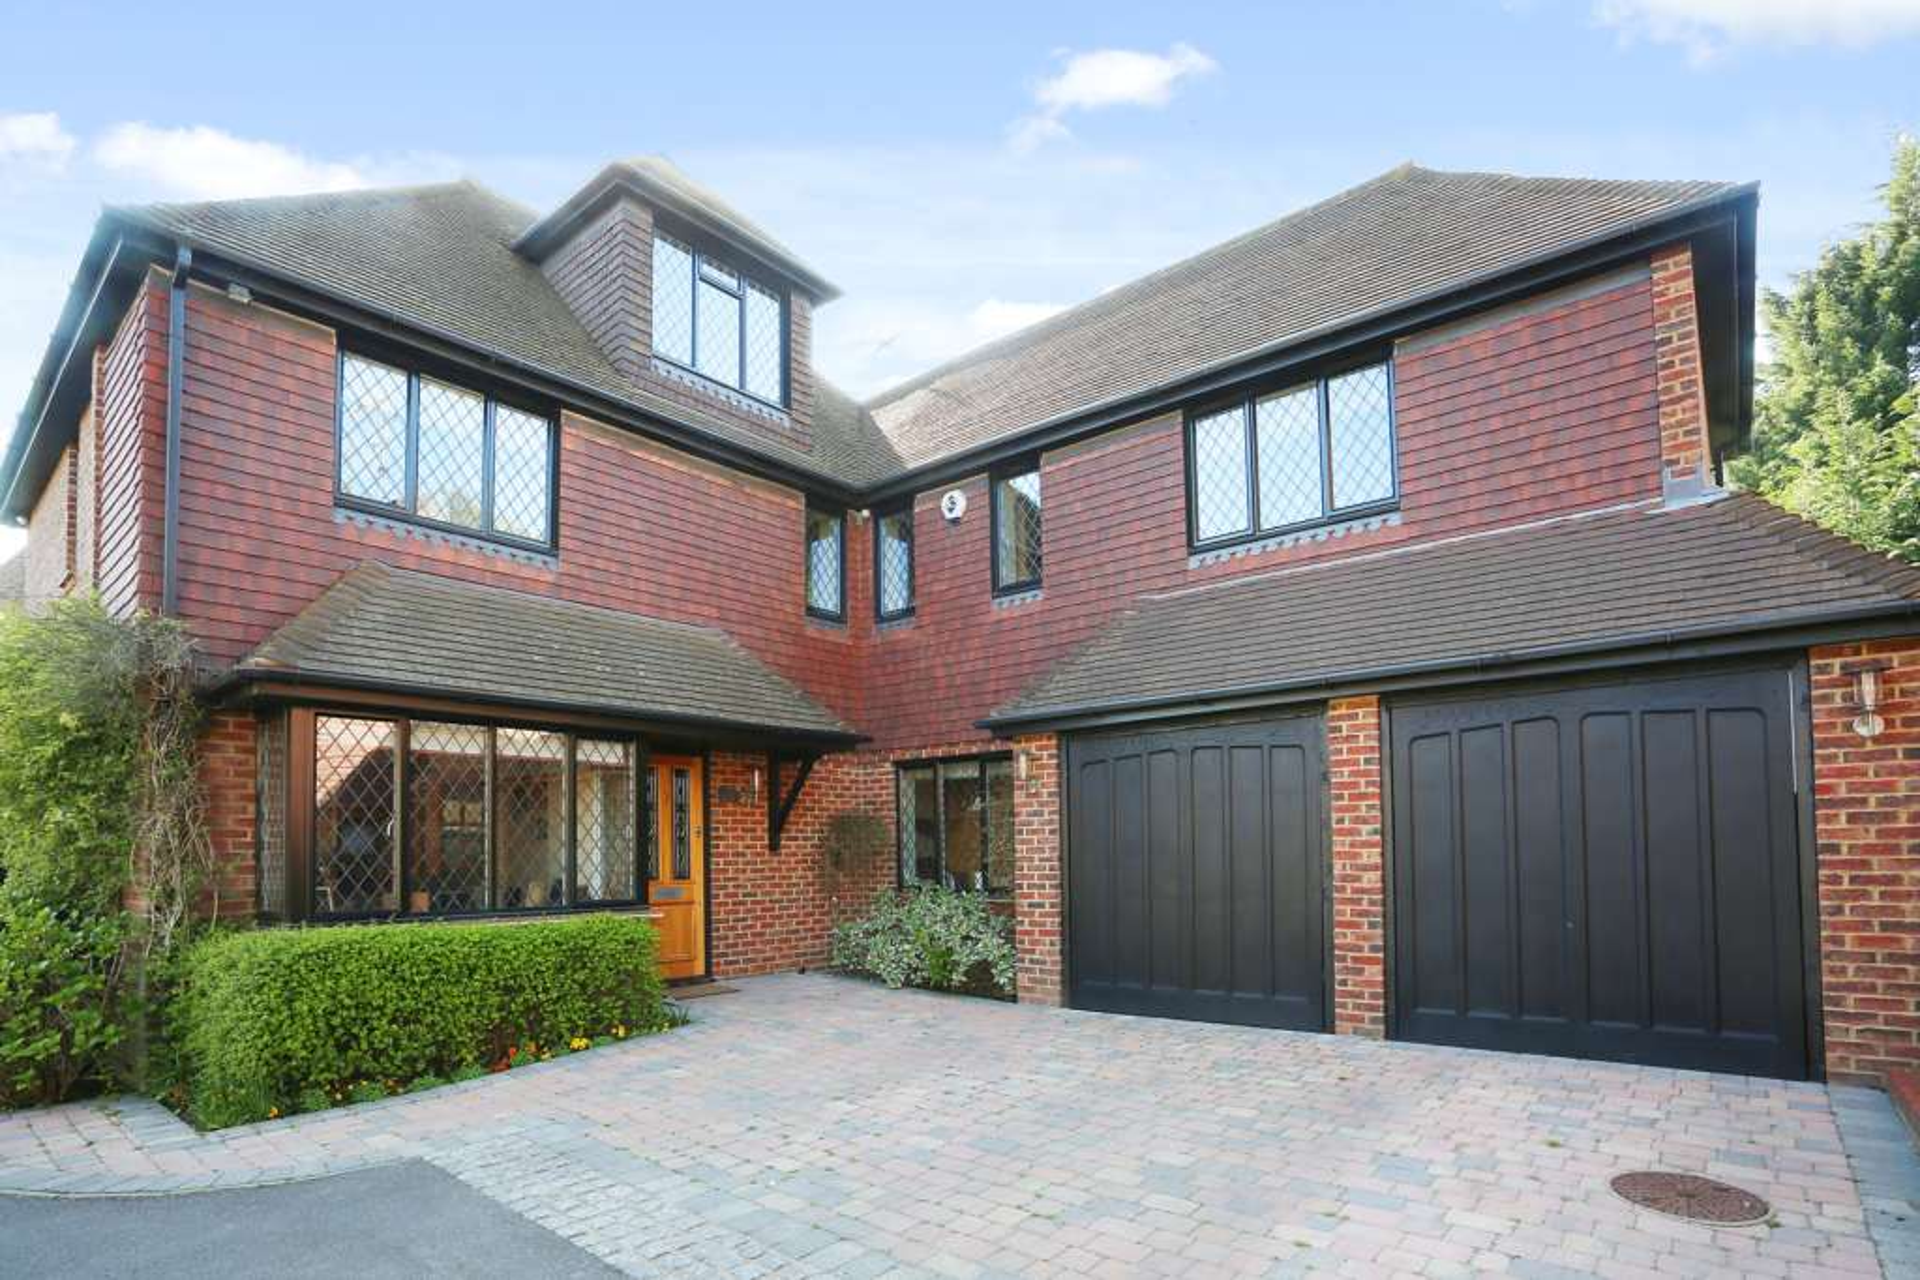 Direct Residential - 6 Bedroom Detached, Park Lane, Ashtead, KT21 1DW